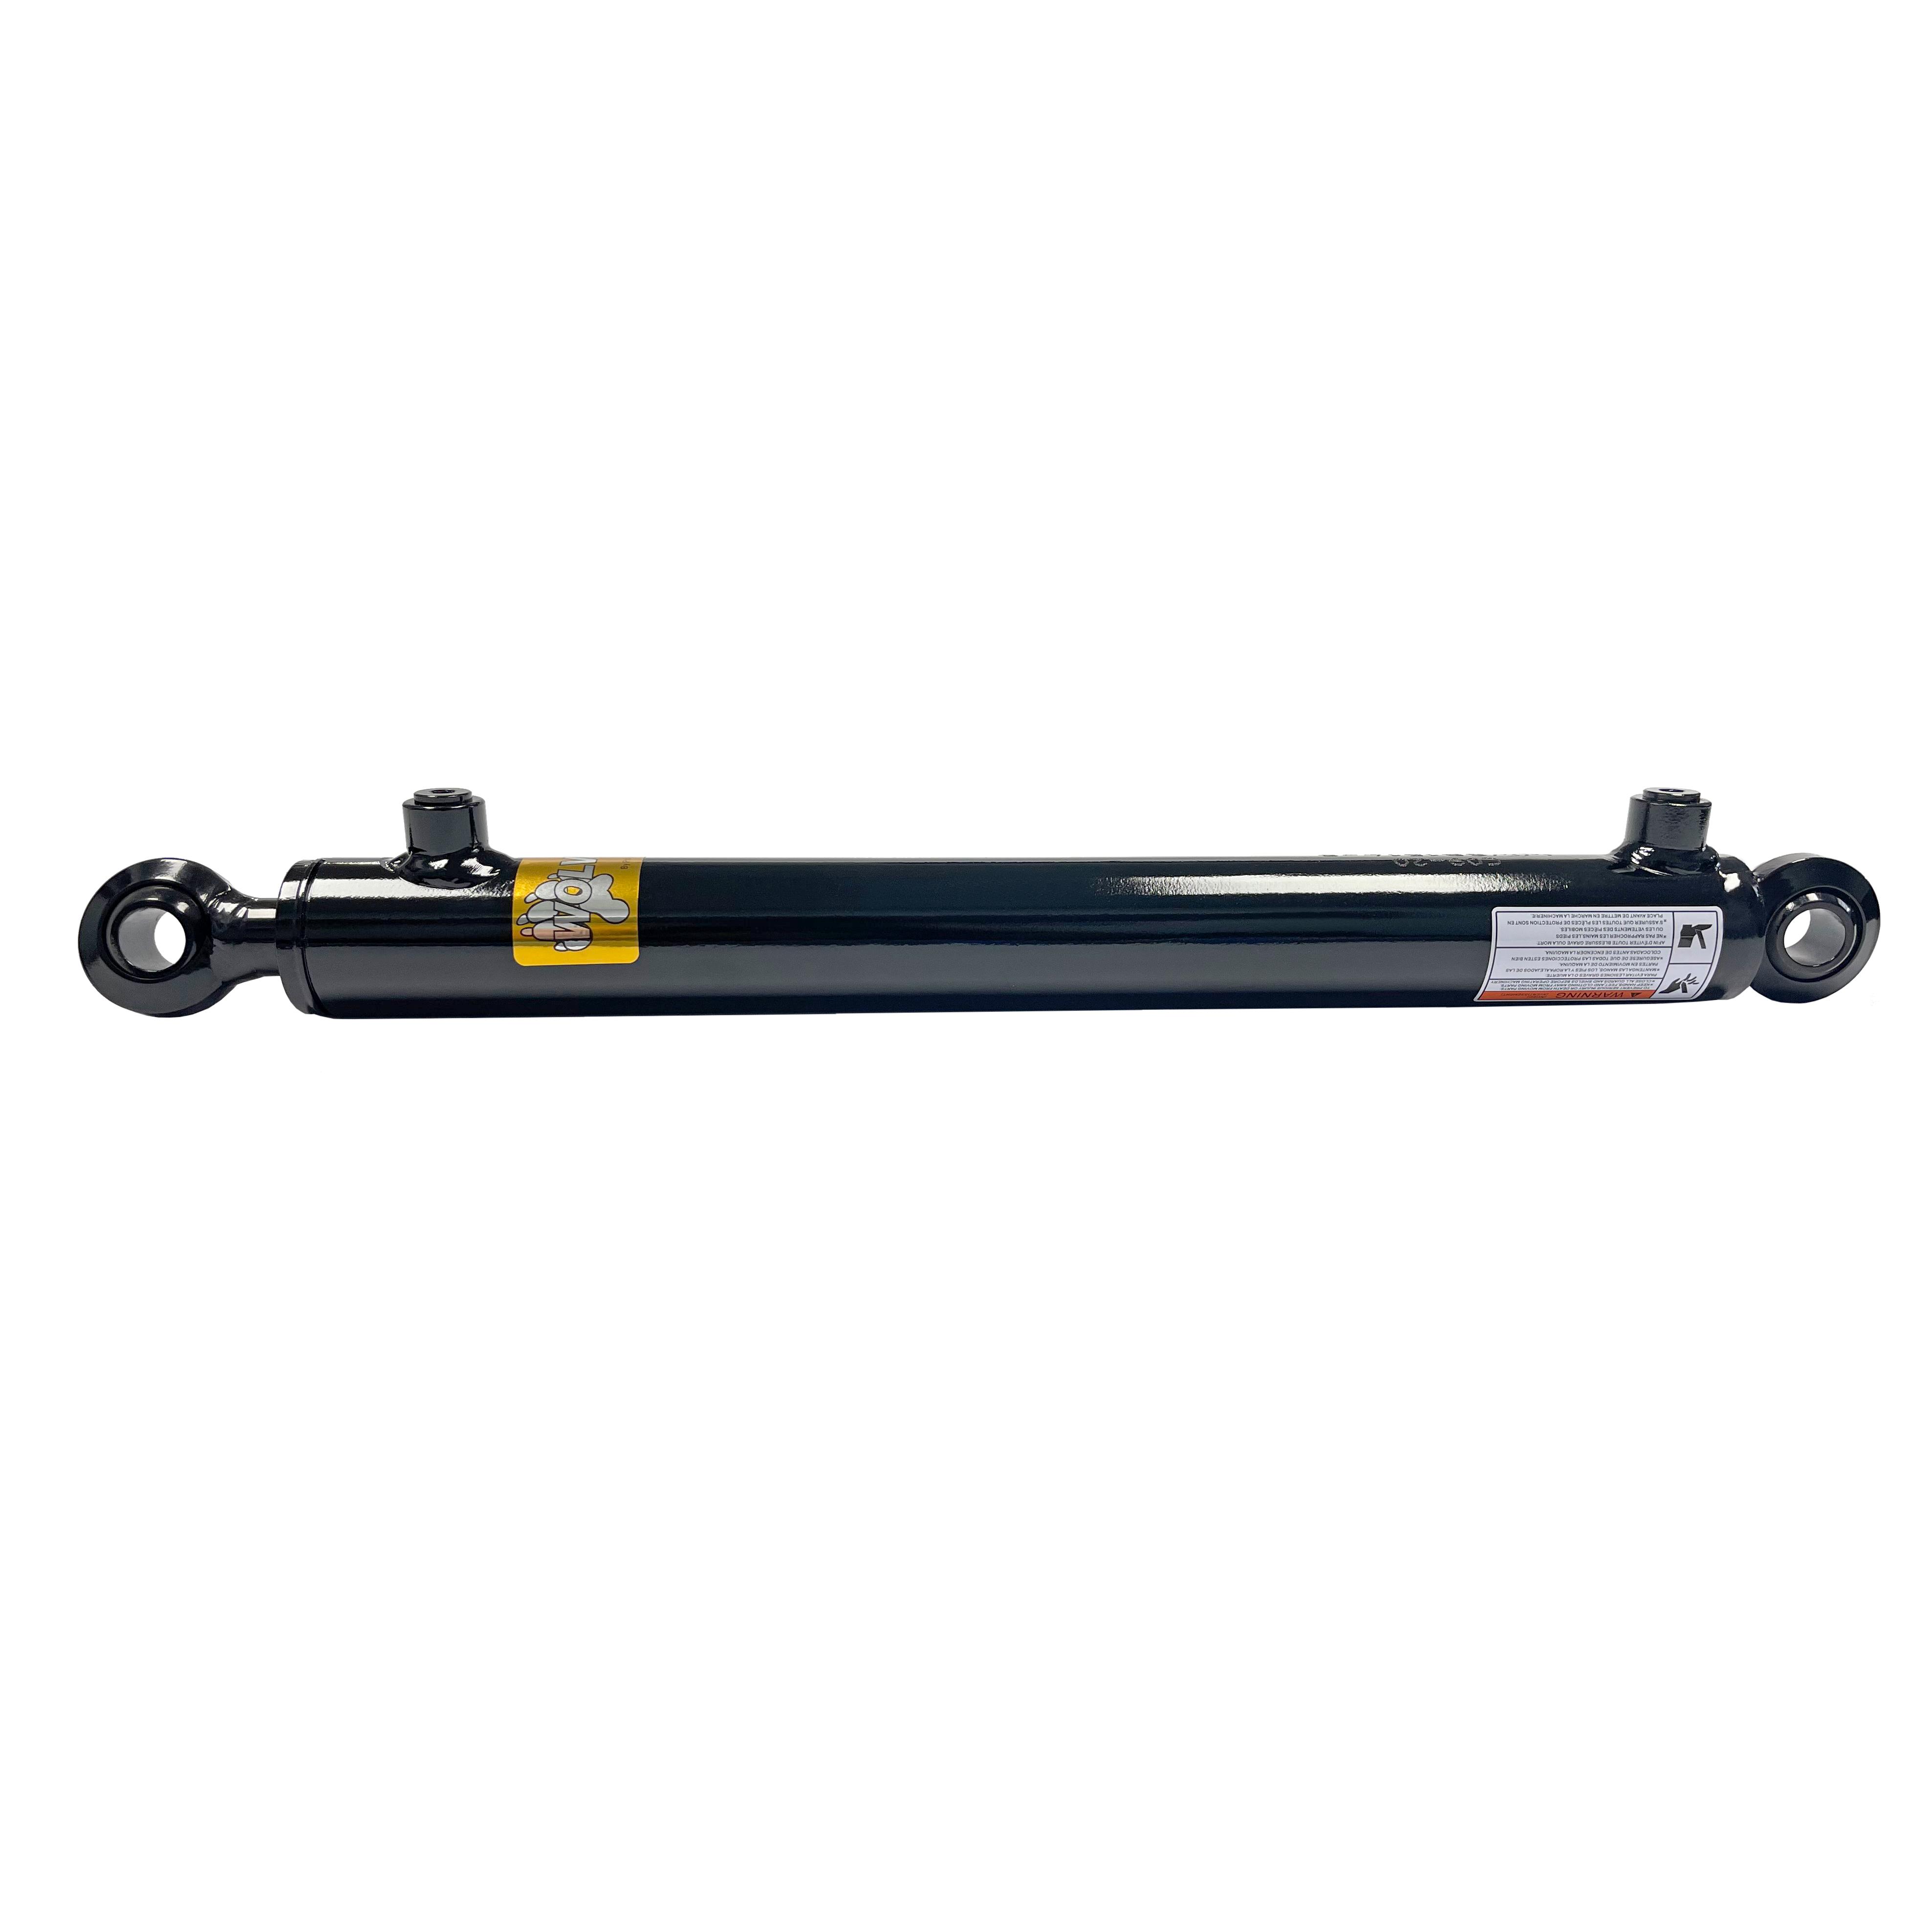 1 bore x 12 stroke swivel eye hydraulic cylinder, welded swivel eye double acting cylinder | Prince Hydraulics